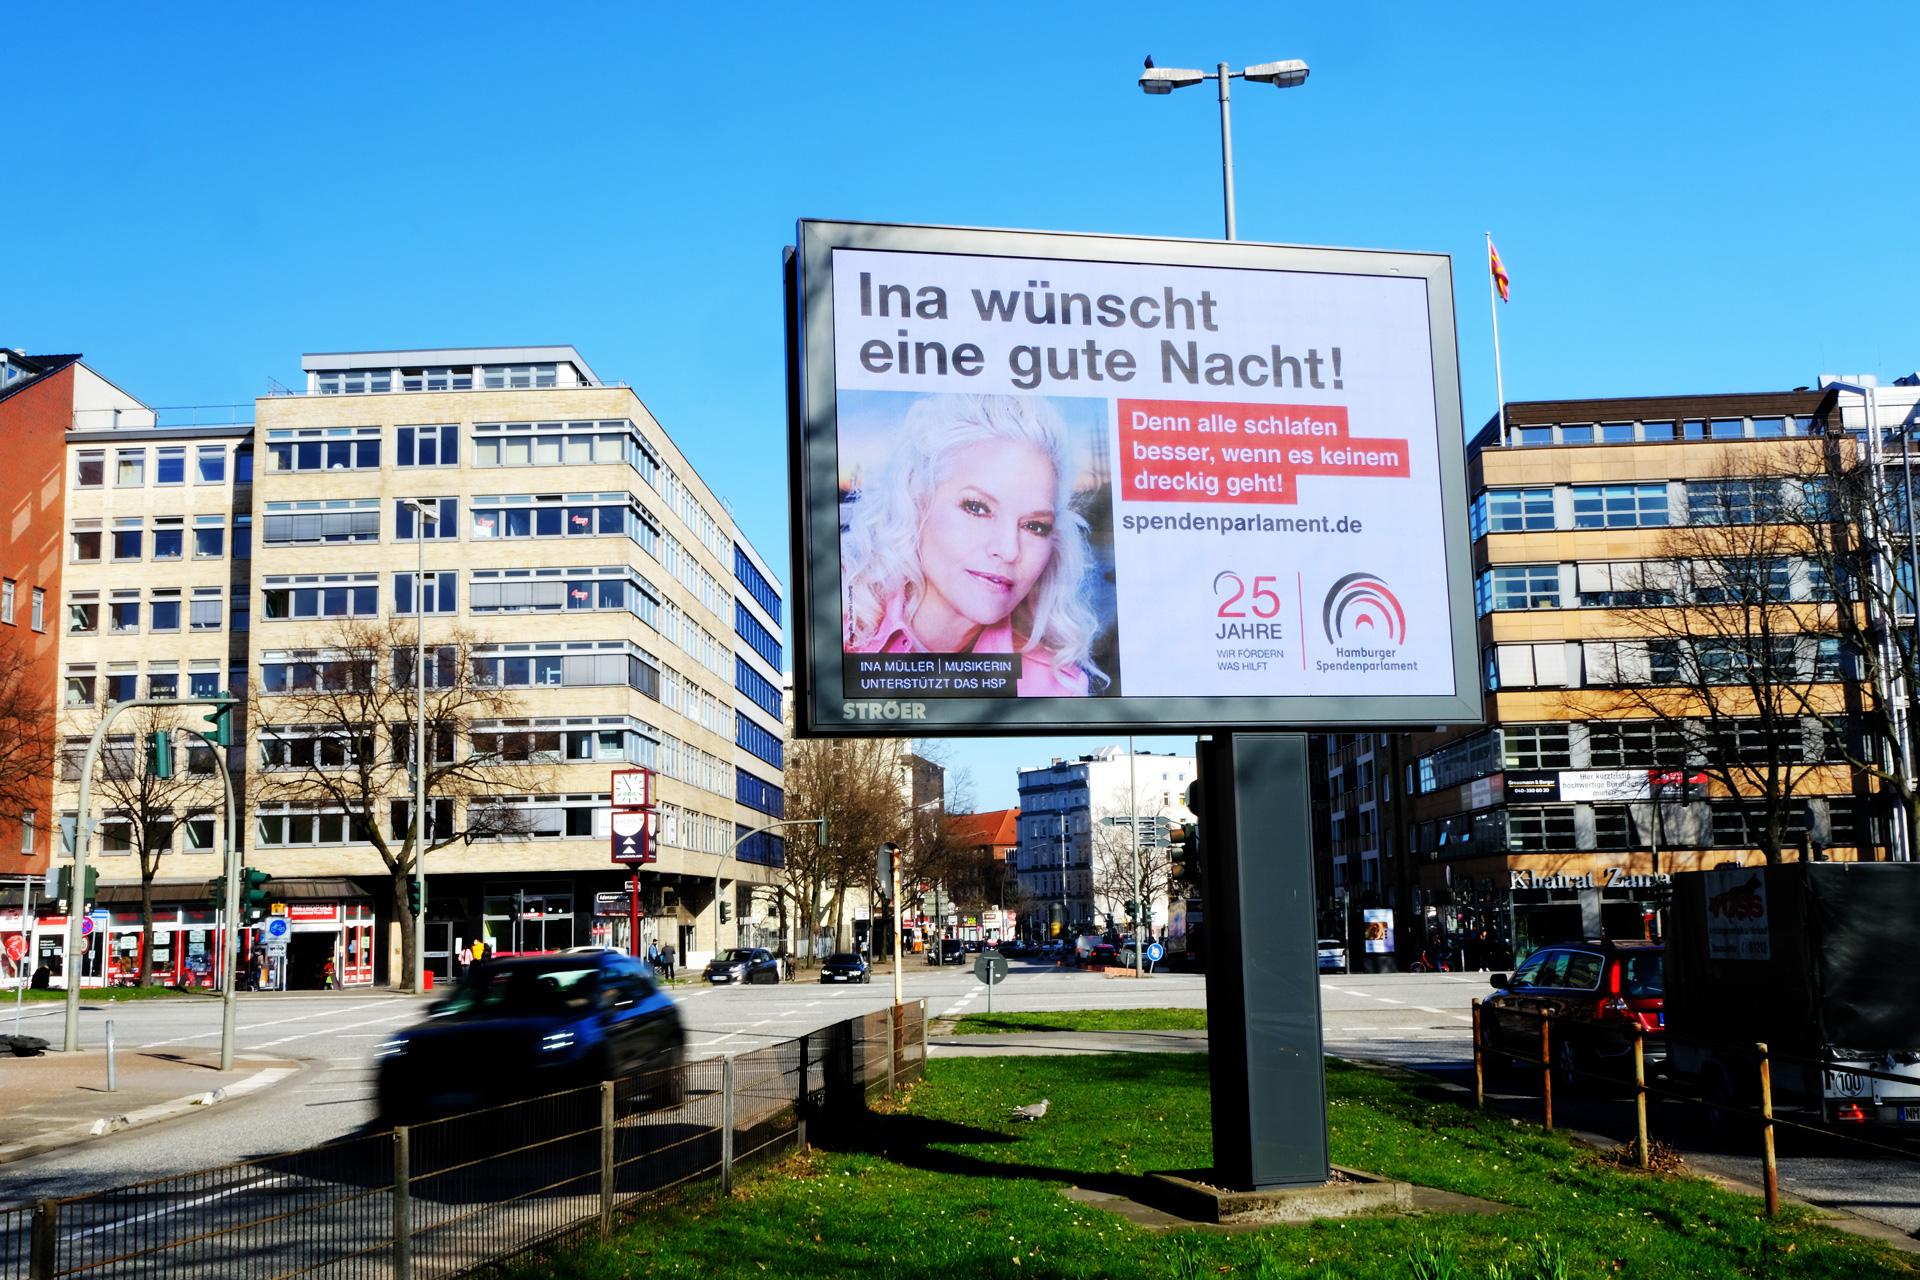 WERK4_Hamburger-Spendenparlament_Ina